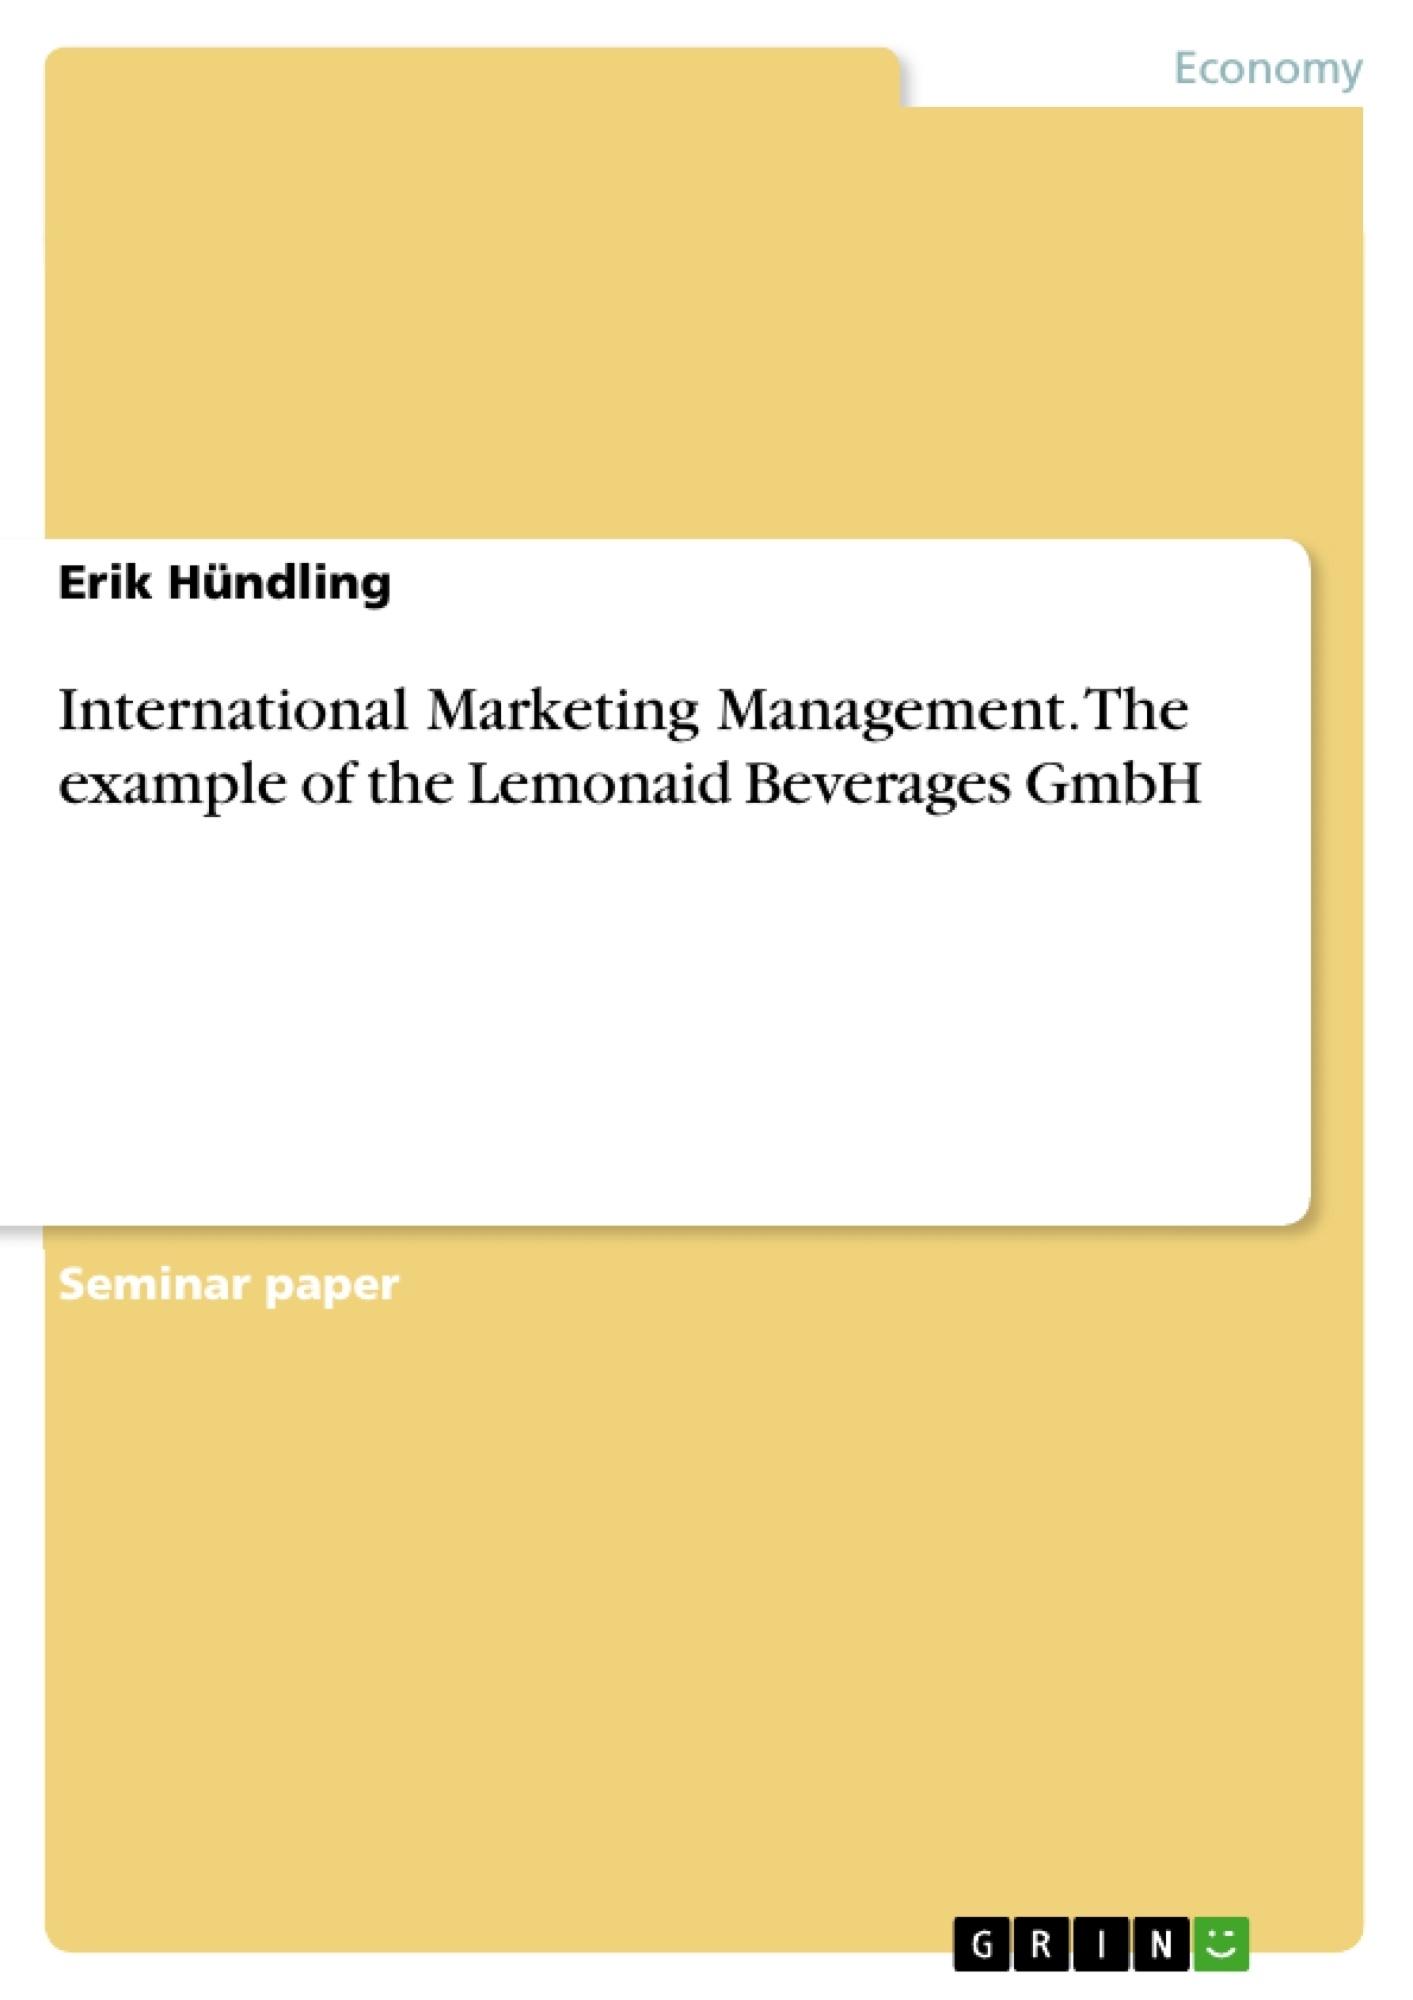 Title: International Marketing Management. The example of the Lemonaid Beverages GmbH